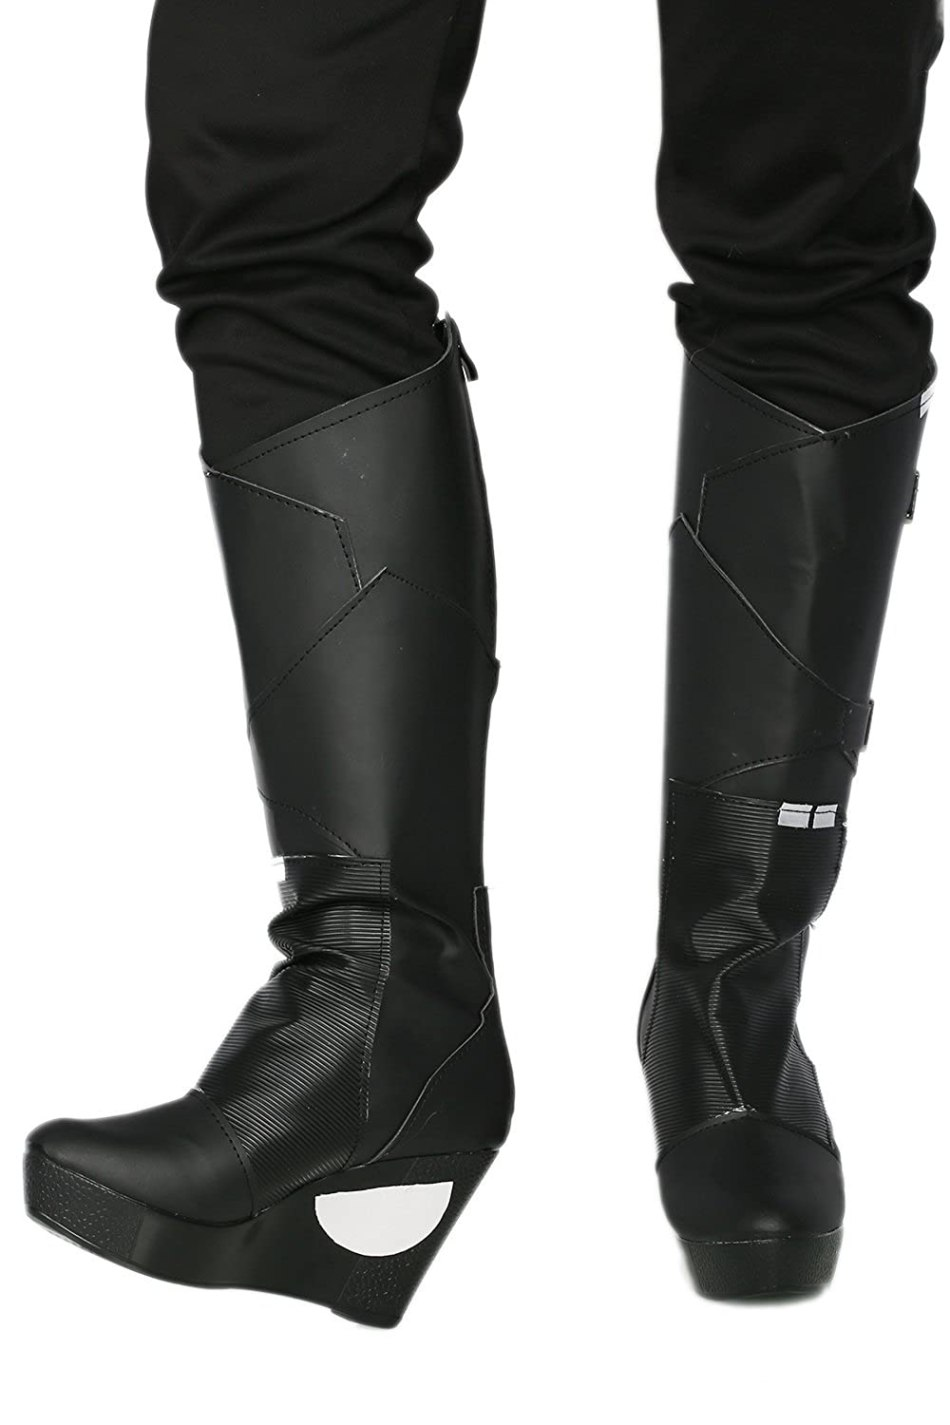 Zoe Gamora Movie Cosplay Costume Black Wedge Womens Mid-calf Boots Shoes